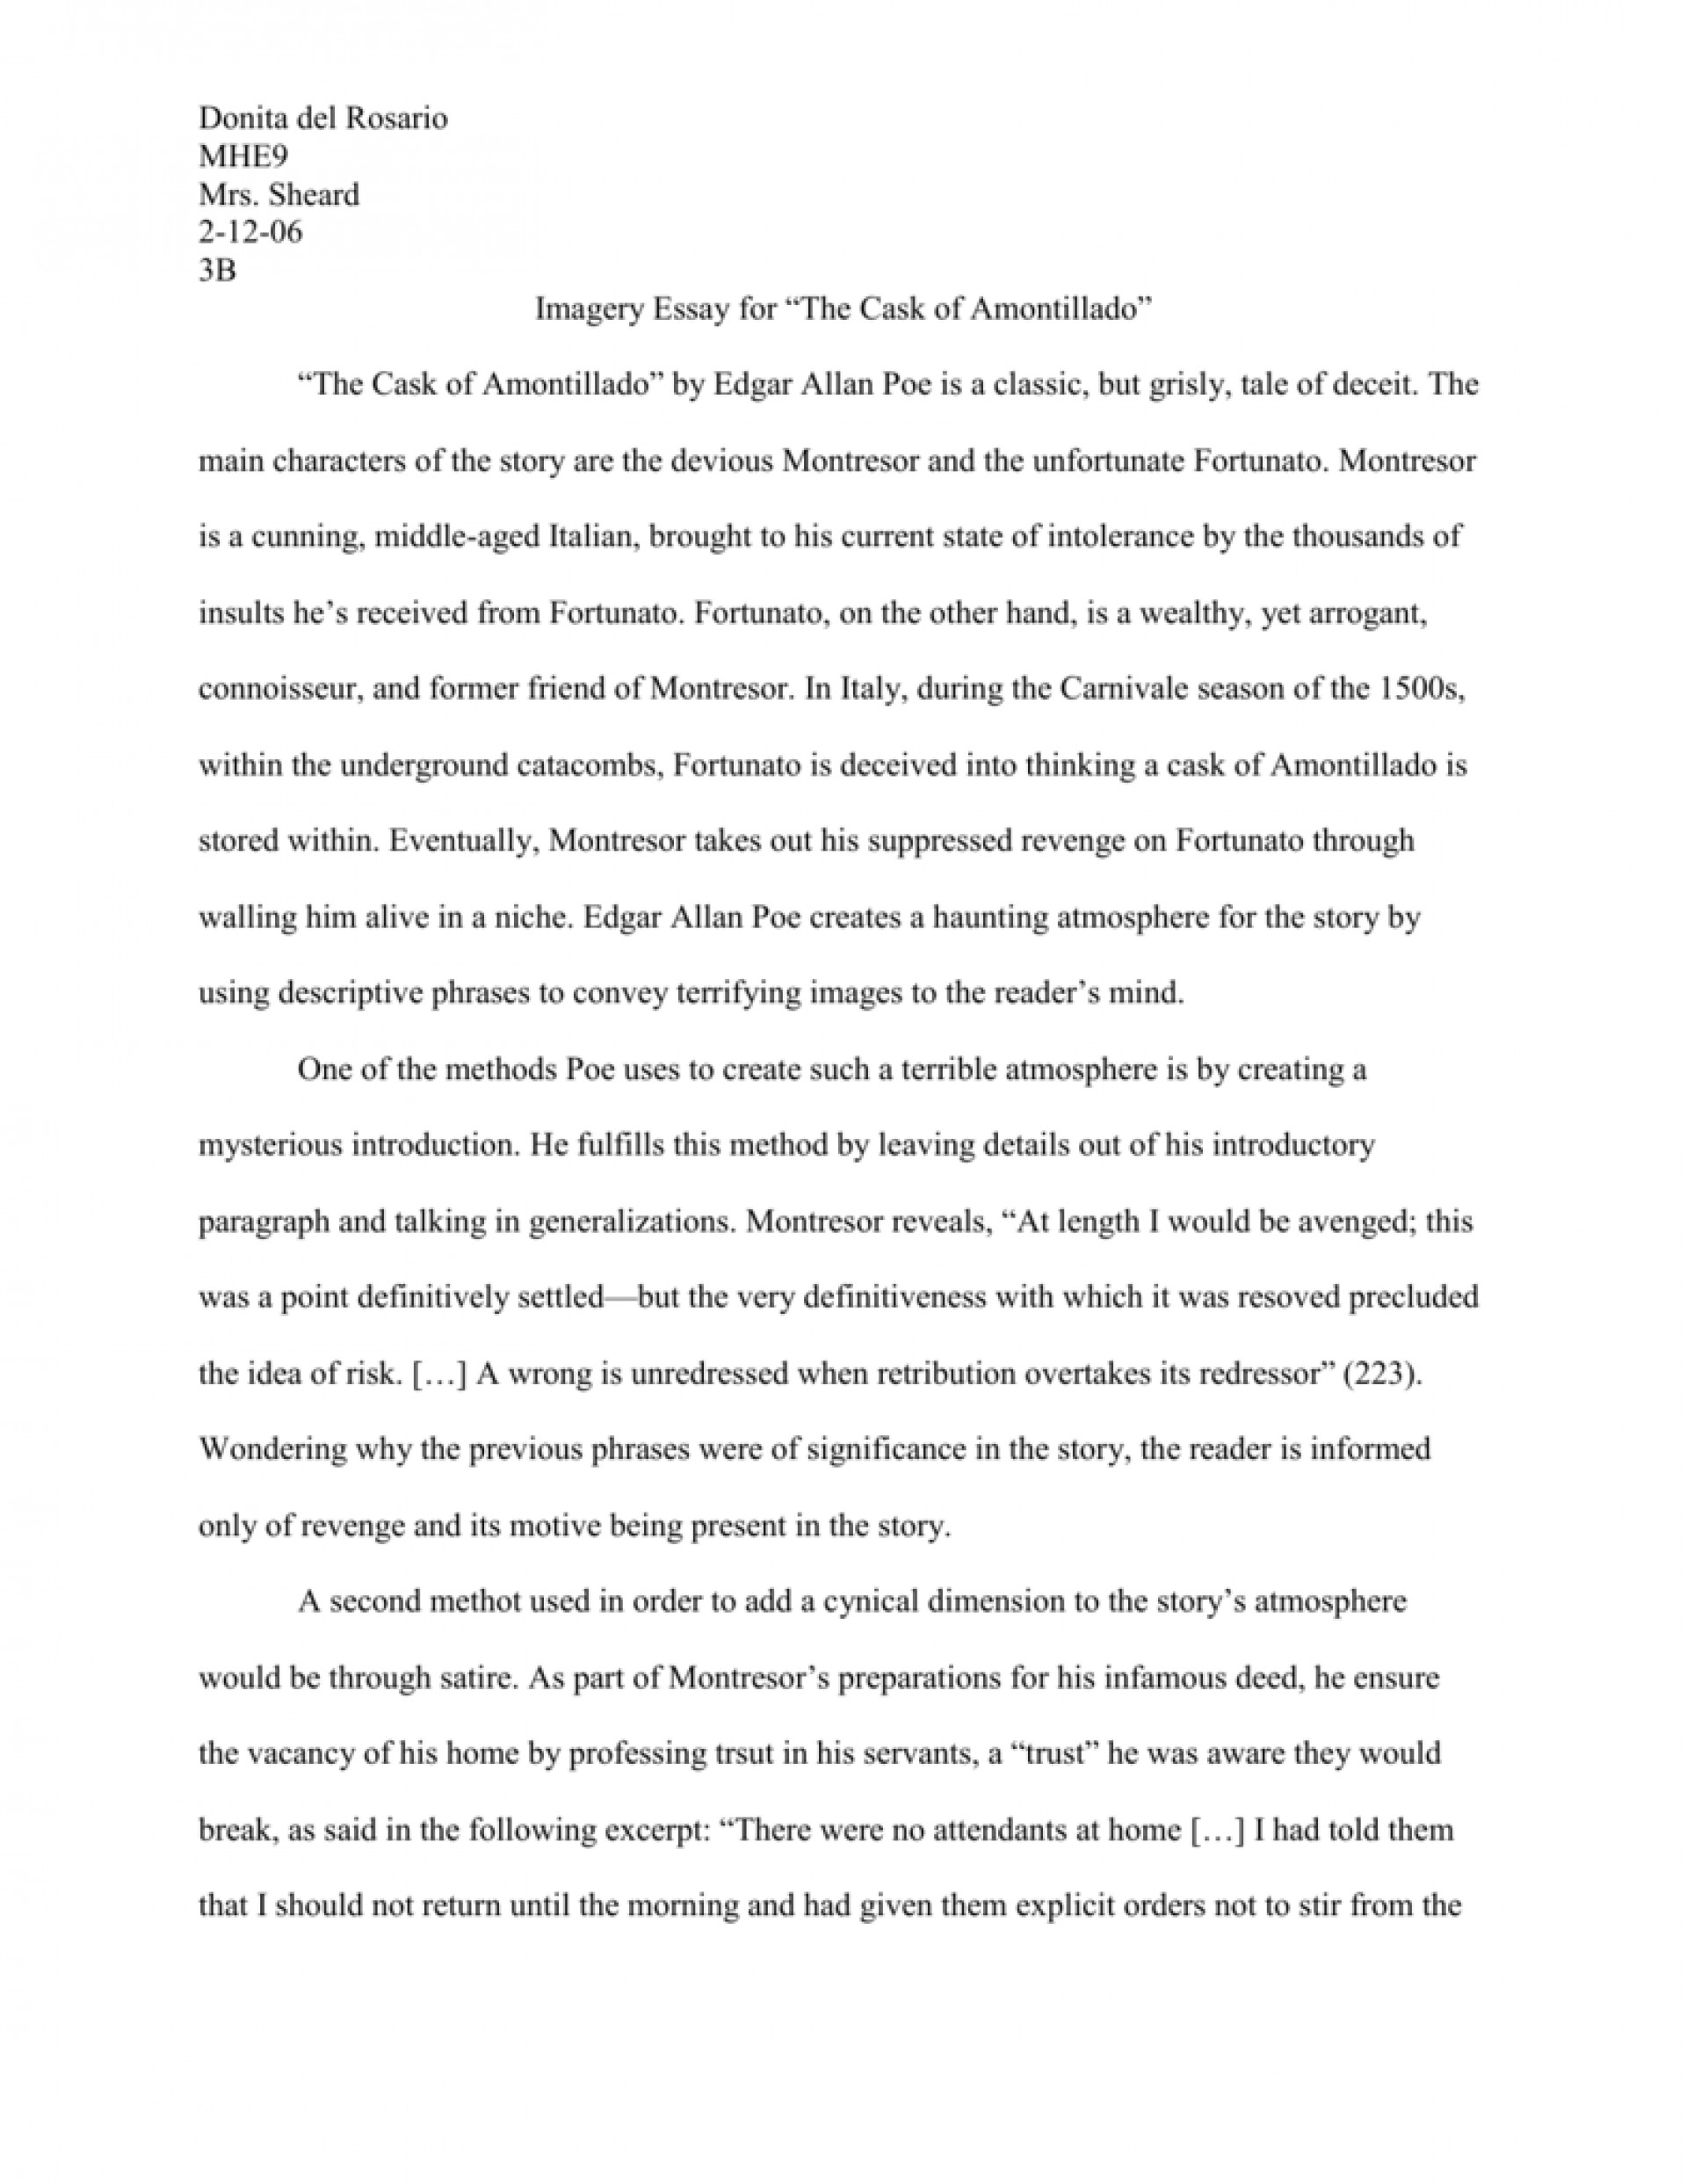 002 Essay Example 008018307 1 The Cask Of Unforgettable Amontillado Topics Conclusion 1920